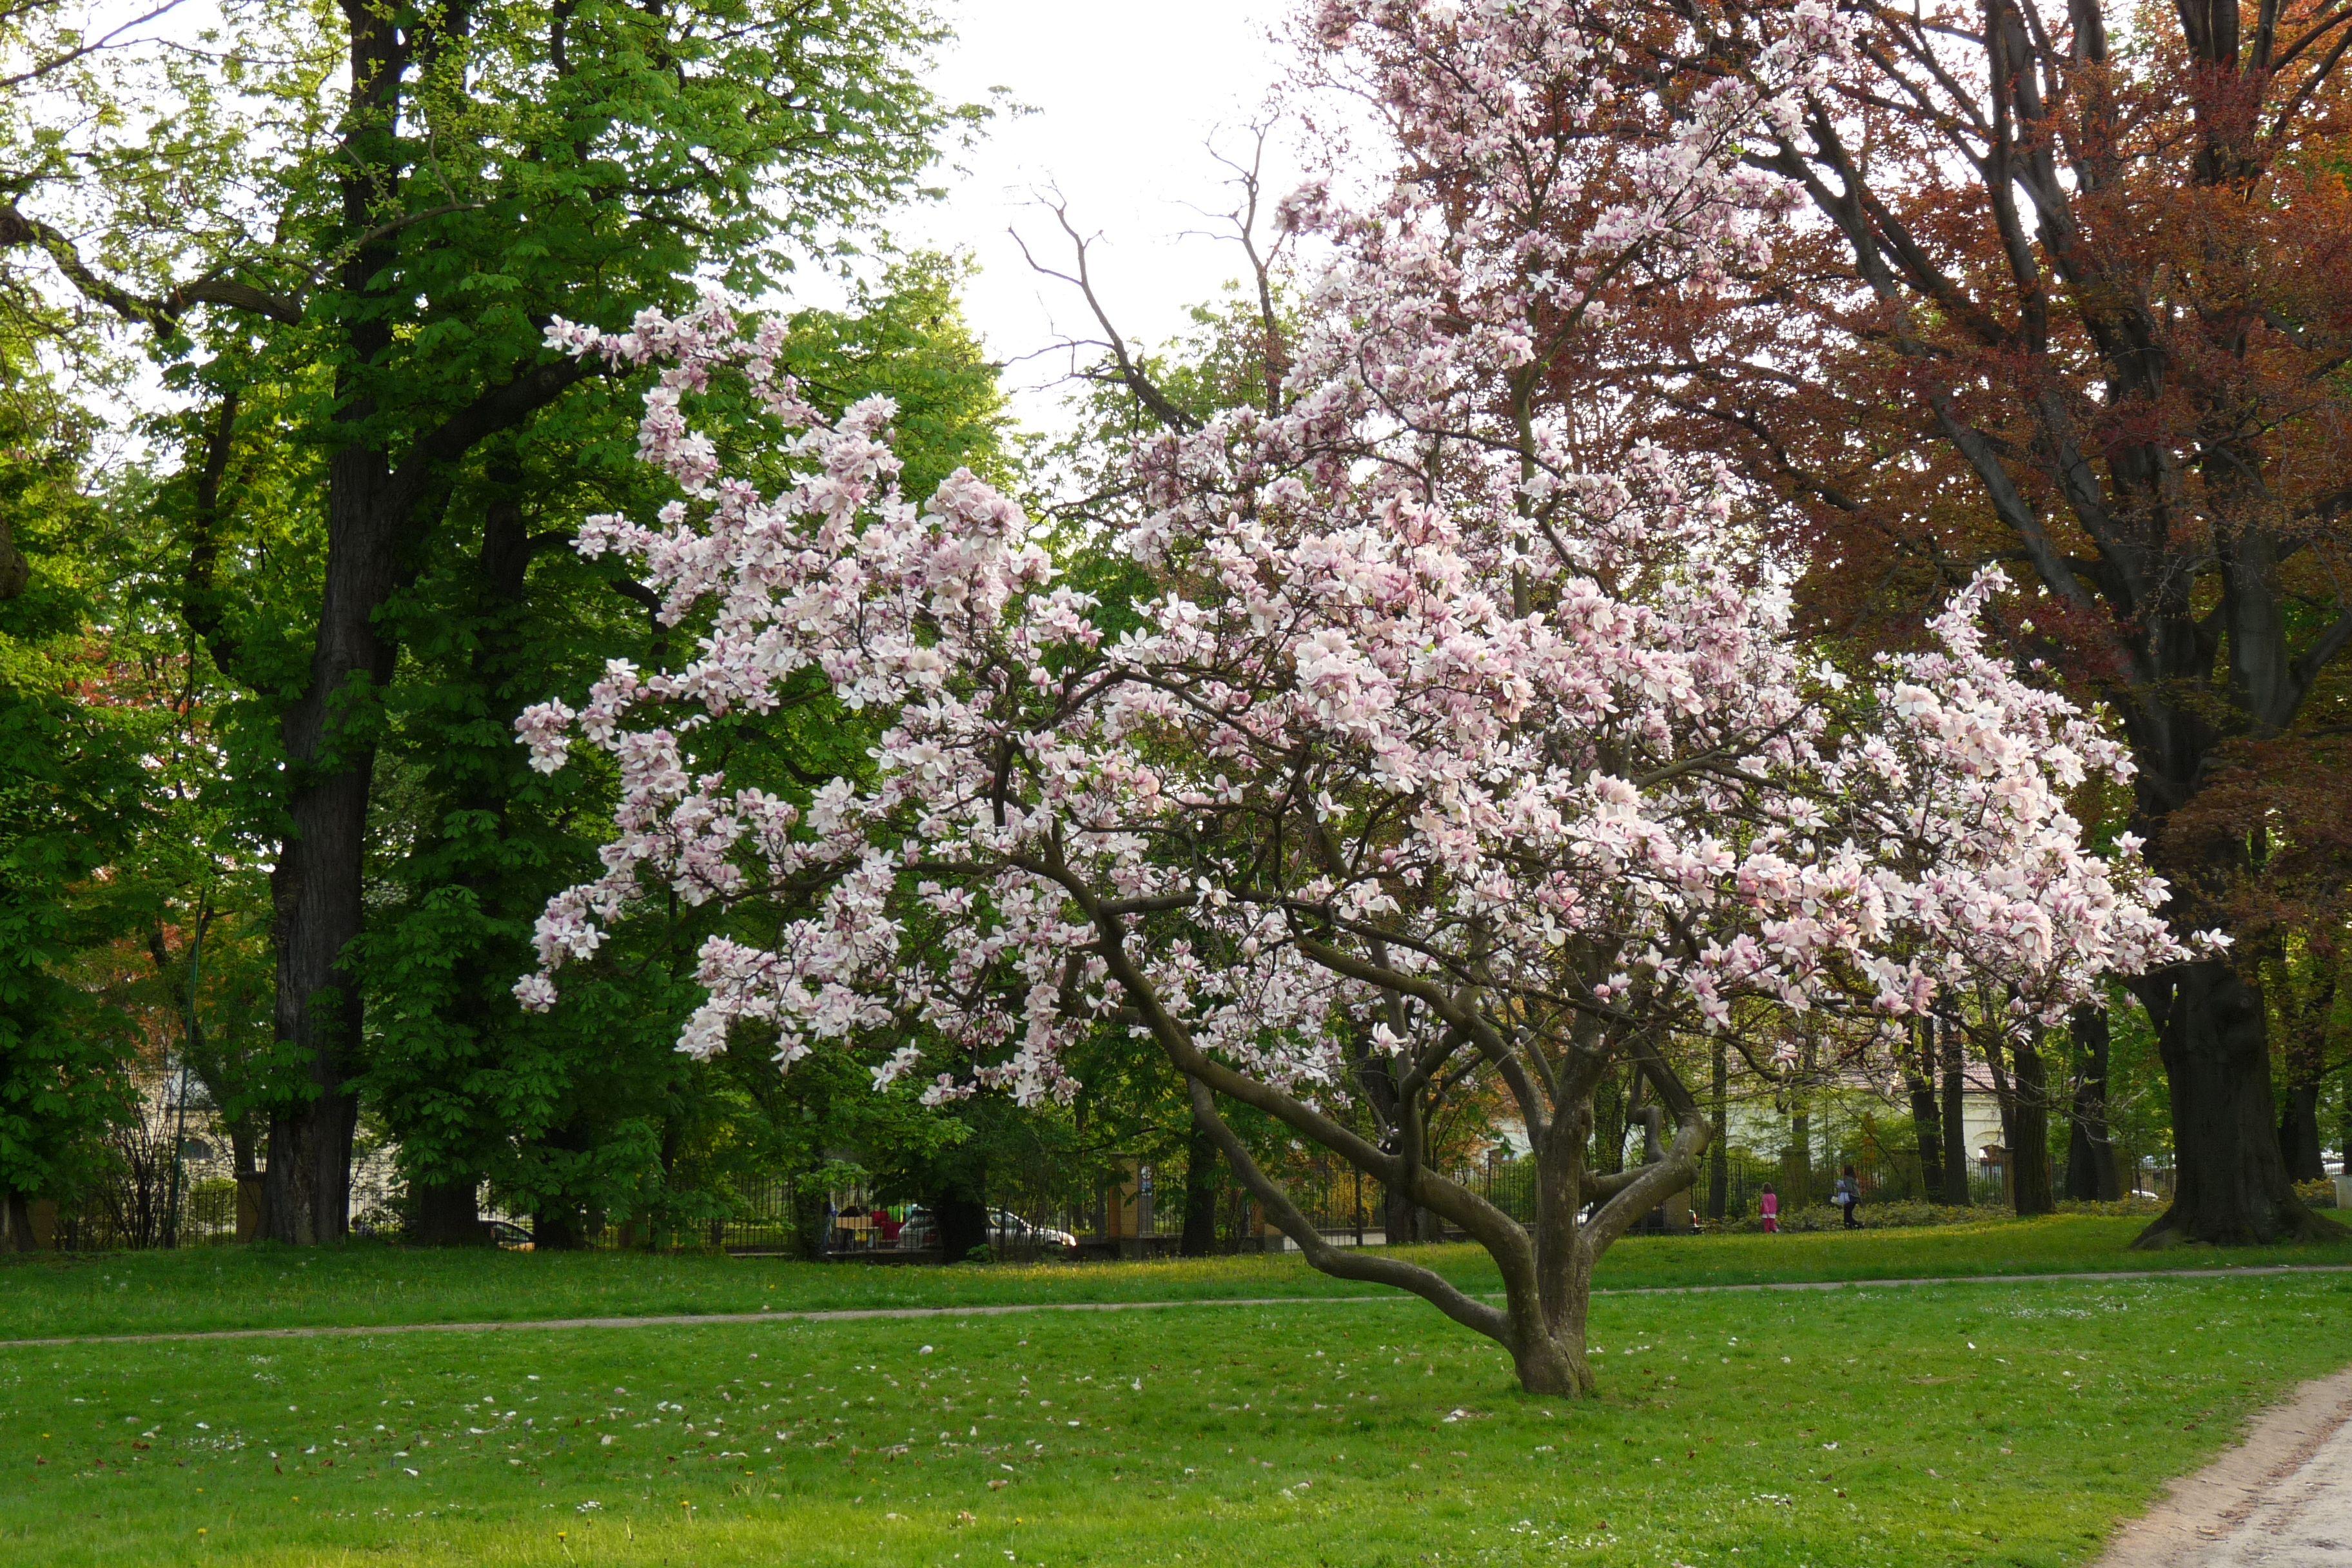 magnolia x soulangeana saucer magnolia zone 4 20 25. Black Bedroom Furniture Sets. Home Design Ideas